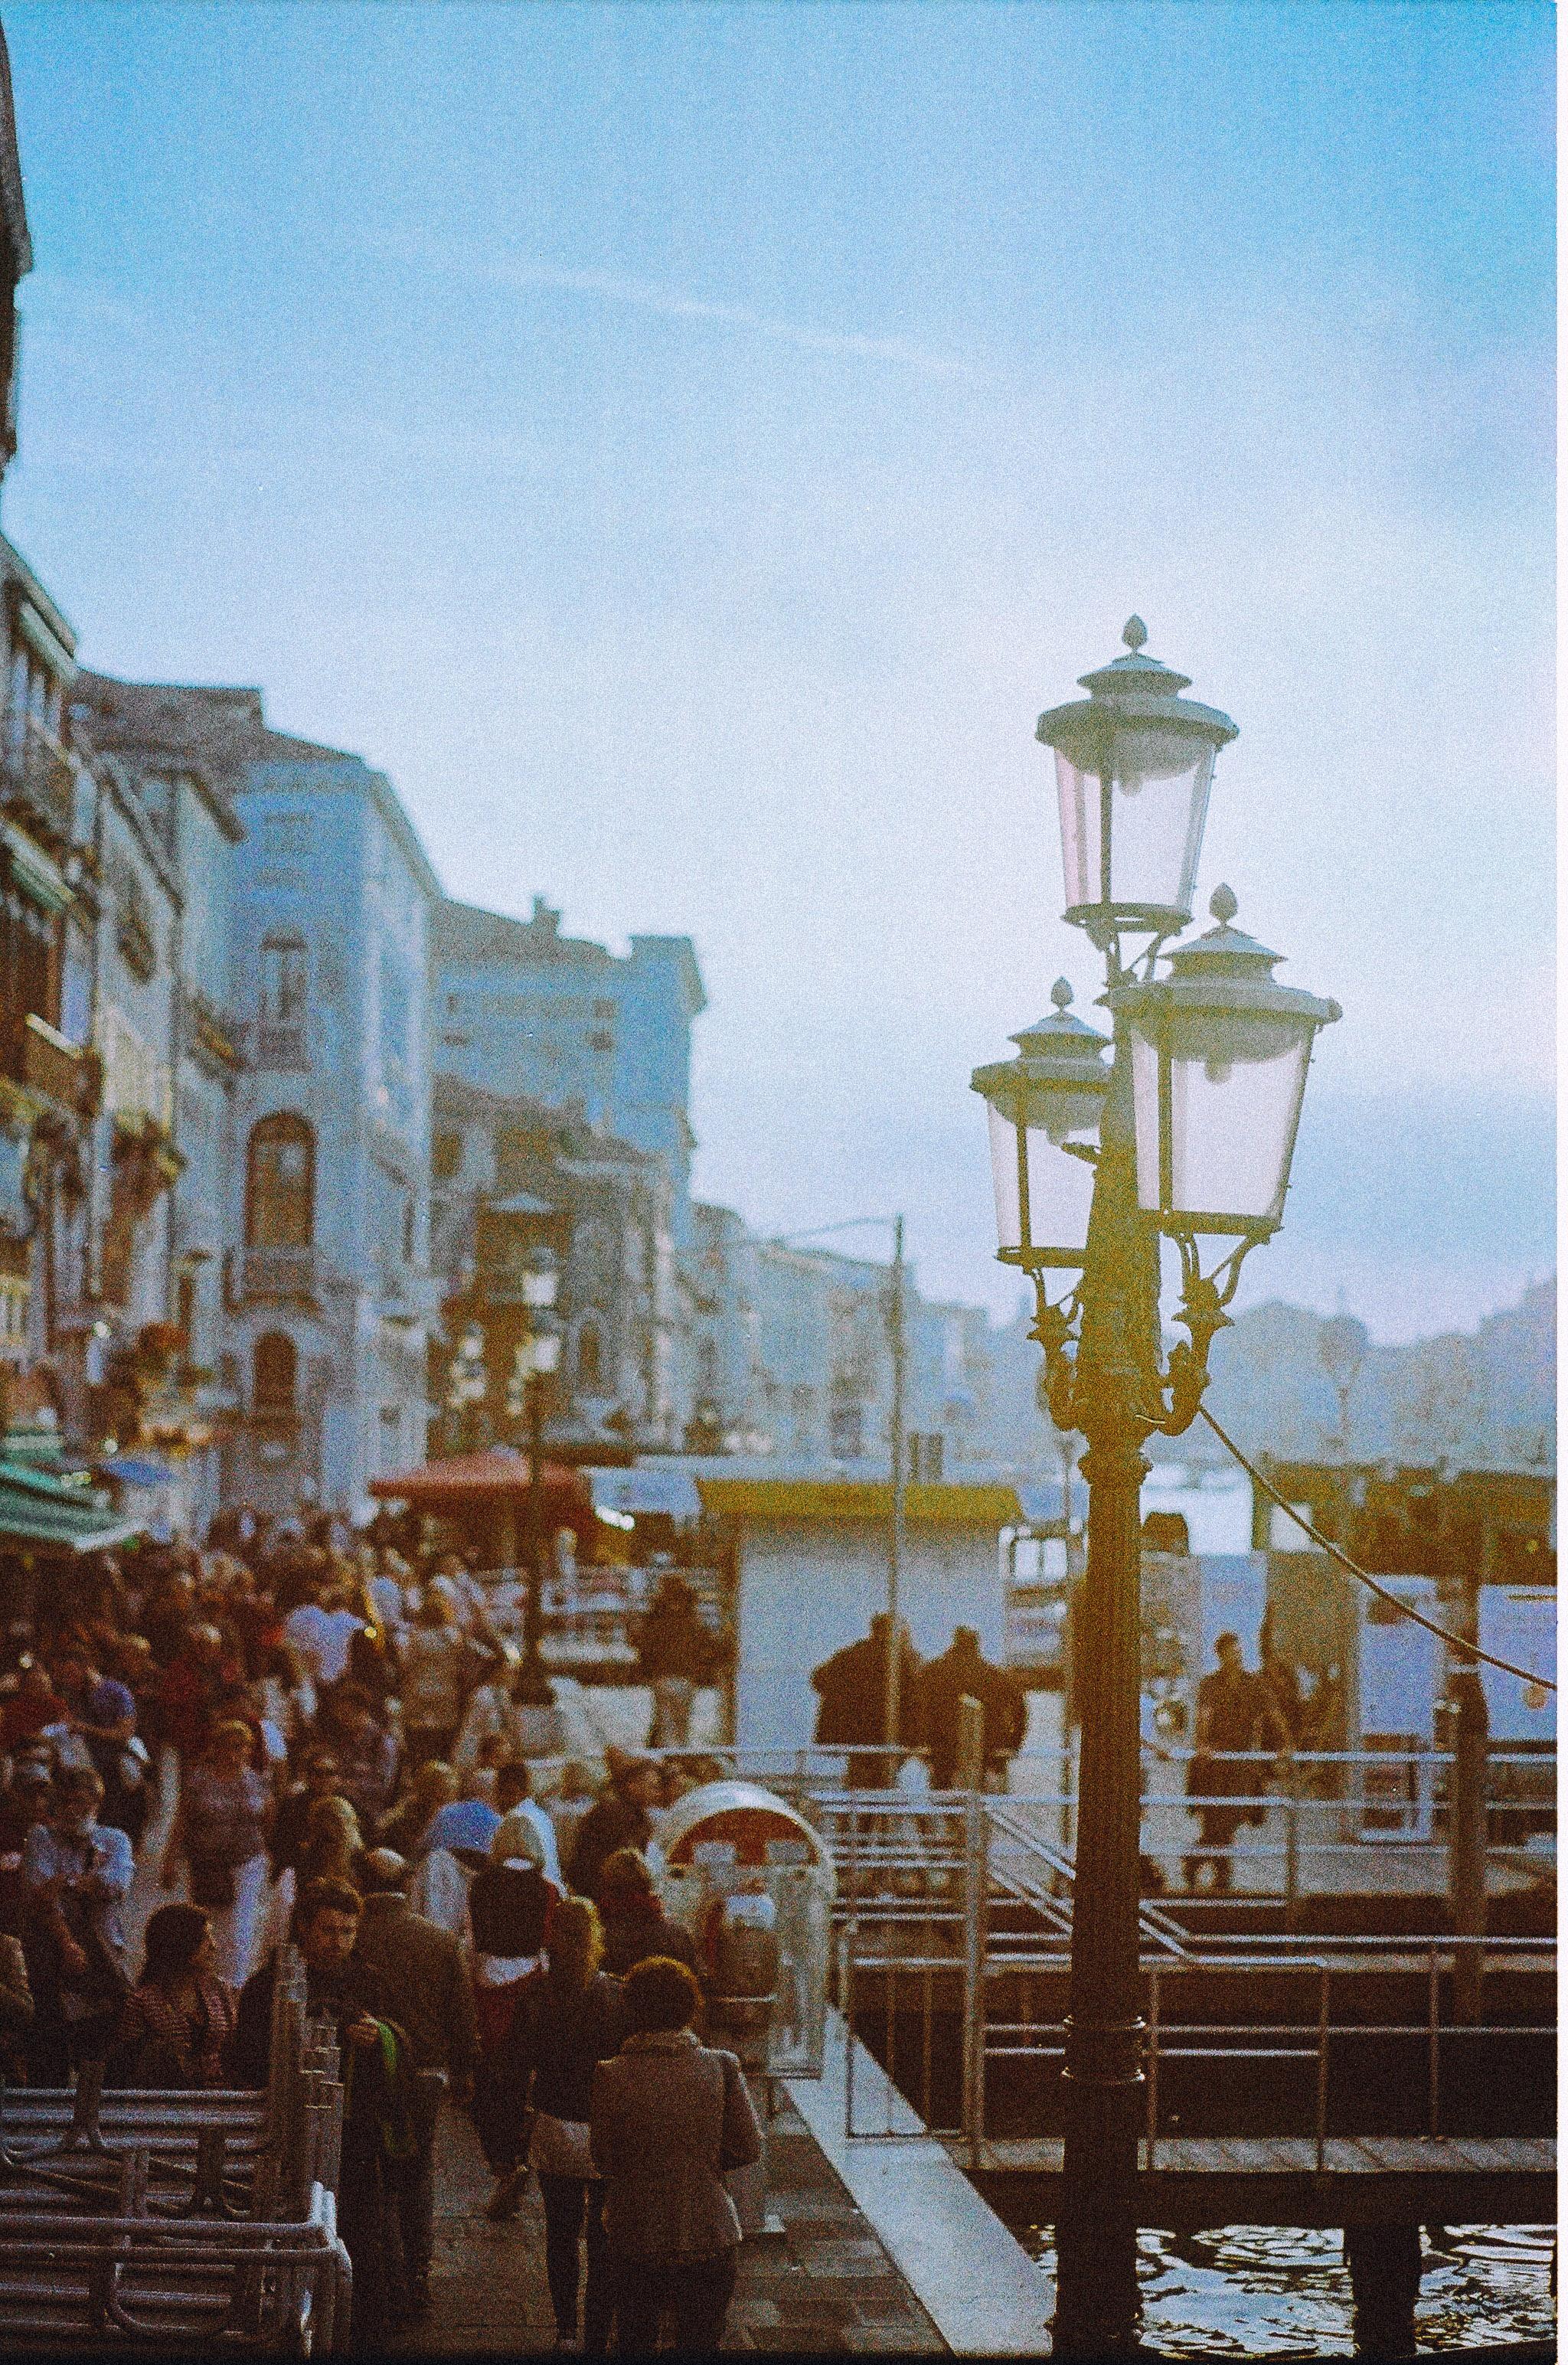 Lesly Lotha_Venice_Italy_Film Photography 03.jpg